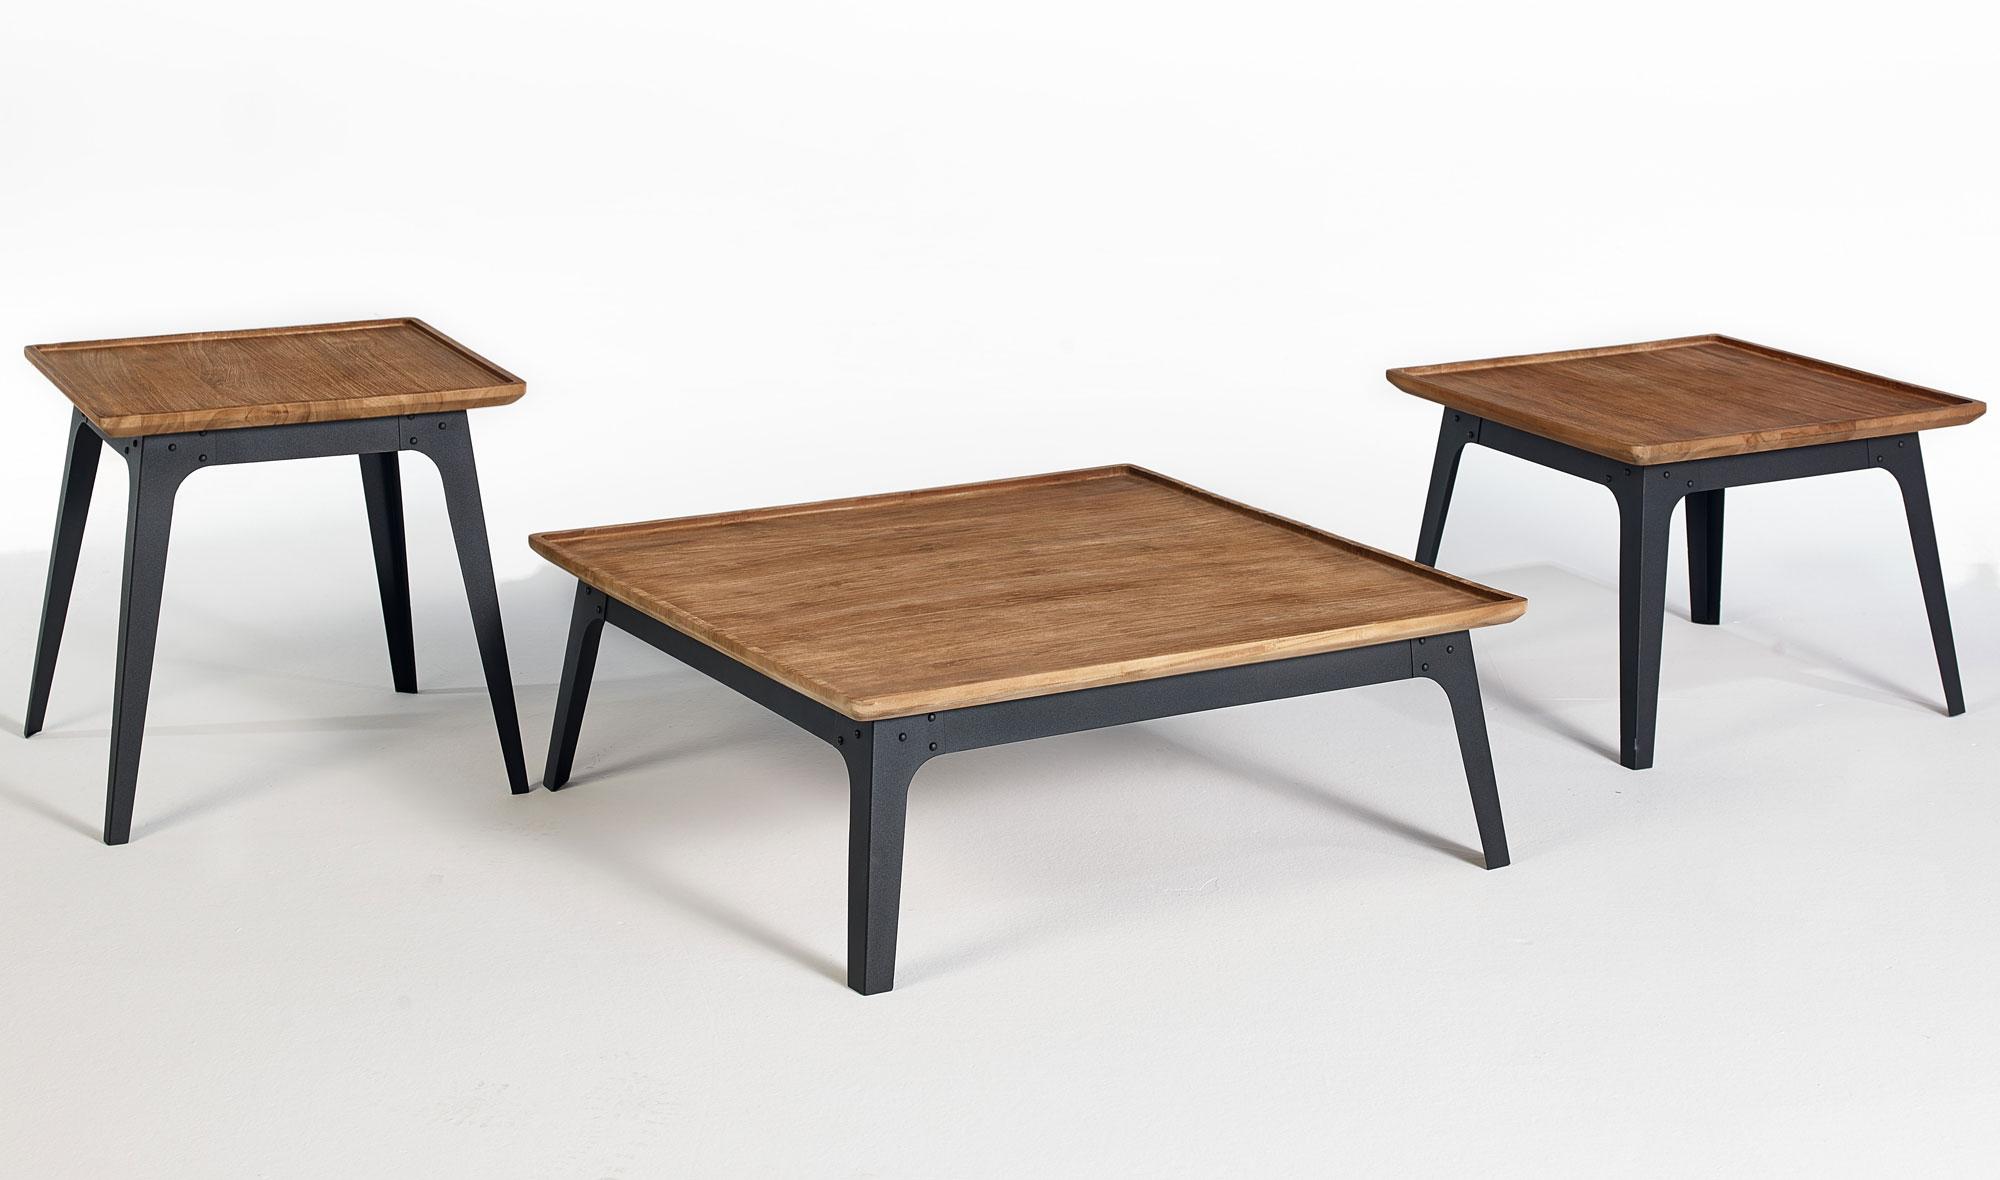 Muebles Martin Peñasco:  Set 3 mesas de centro vintage Leuser - Mesas de Centro Vintage - Muebles Vintage